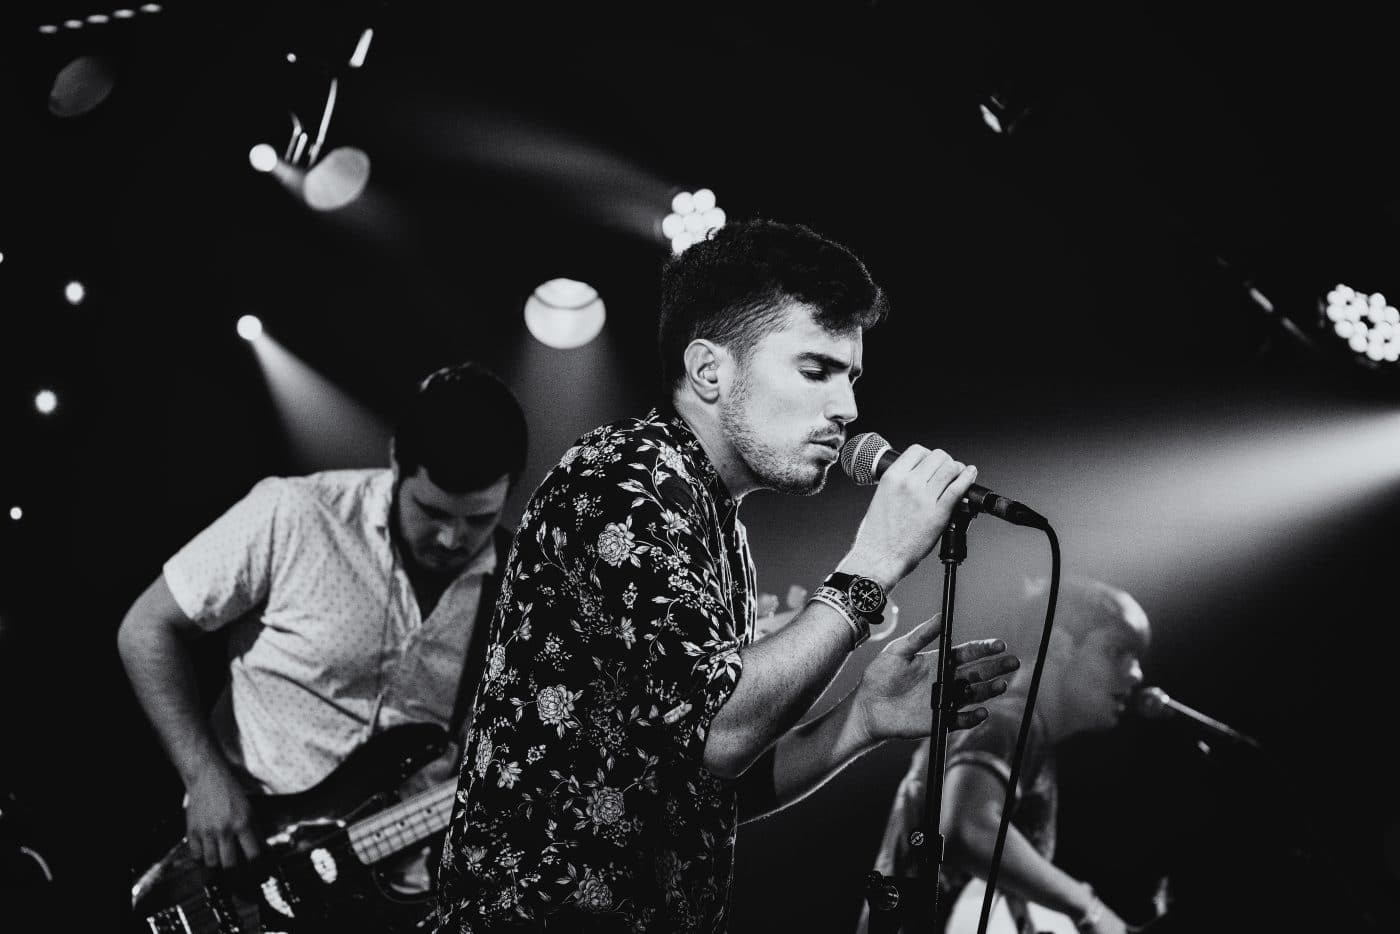 Sub Radio - Rock & Roll Hotel | LIVING LIFE FEARLESS